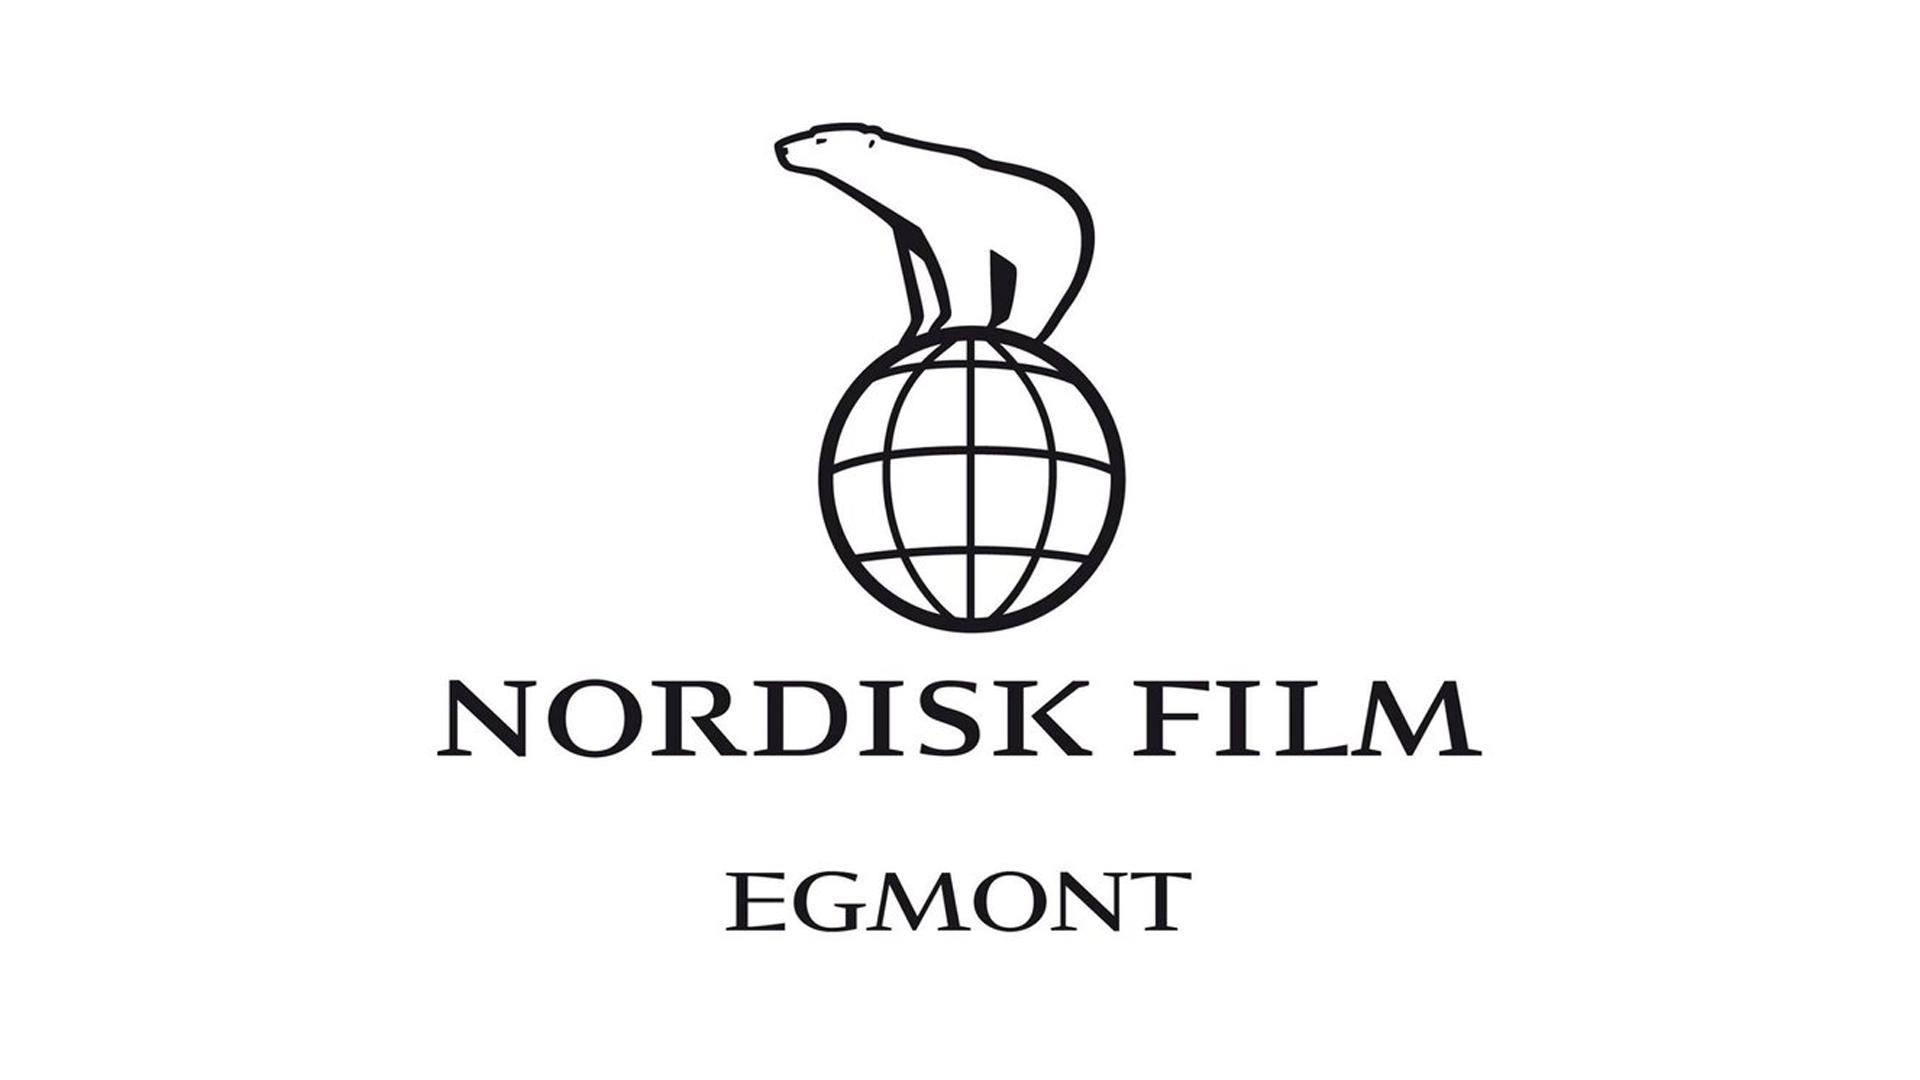 Nordisk Film Interactive / EGMONT    Mobile game producer for Nordisk Film Interactive for 4 months.